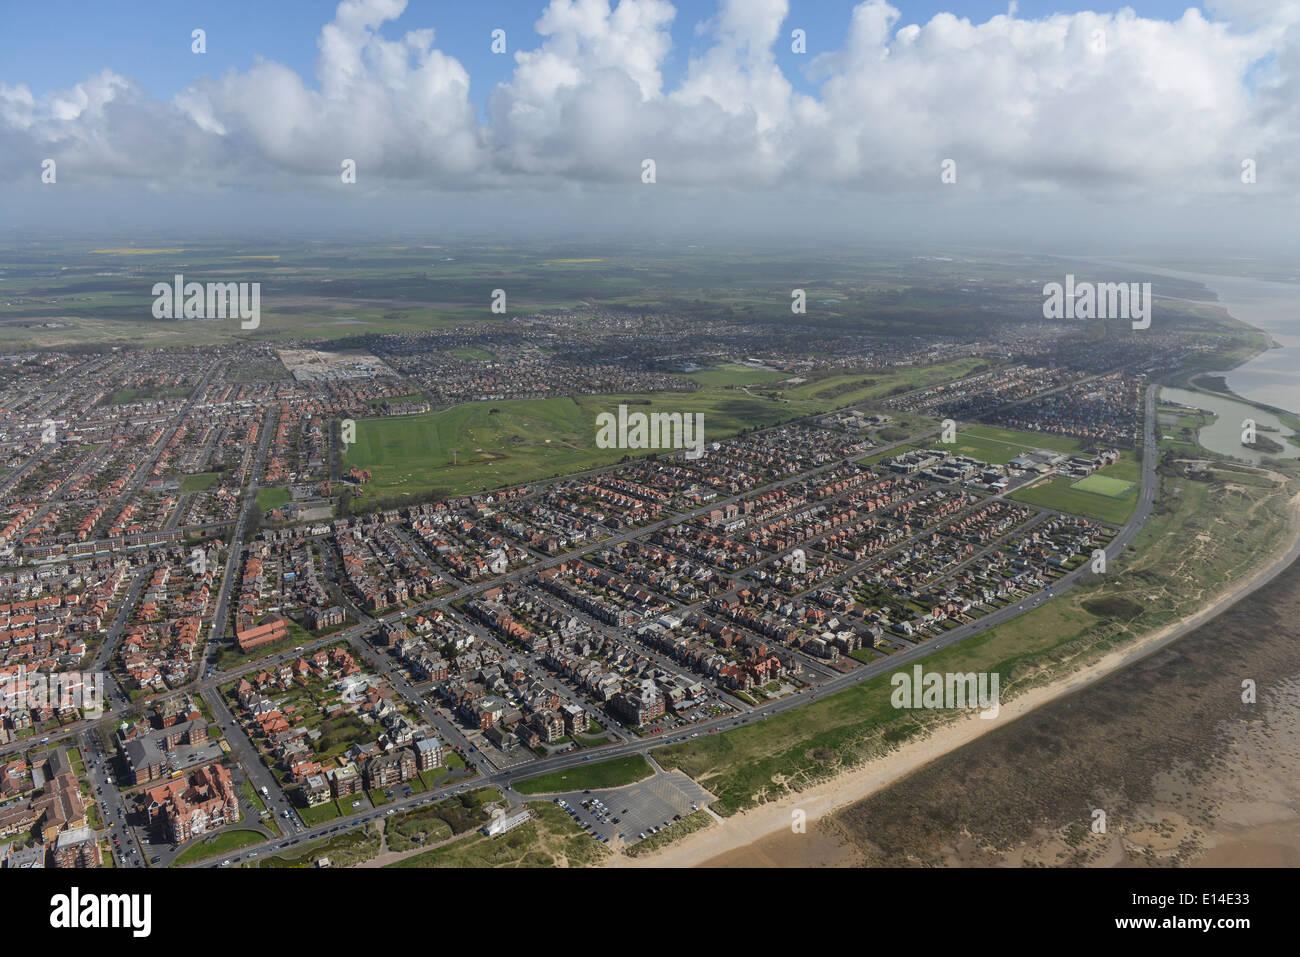 Aerial photograph of Lytham Saint Annes showing Royal Lytham & St Annes Golf Club - Stock Image